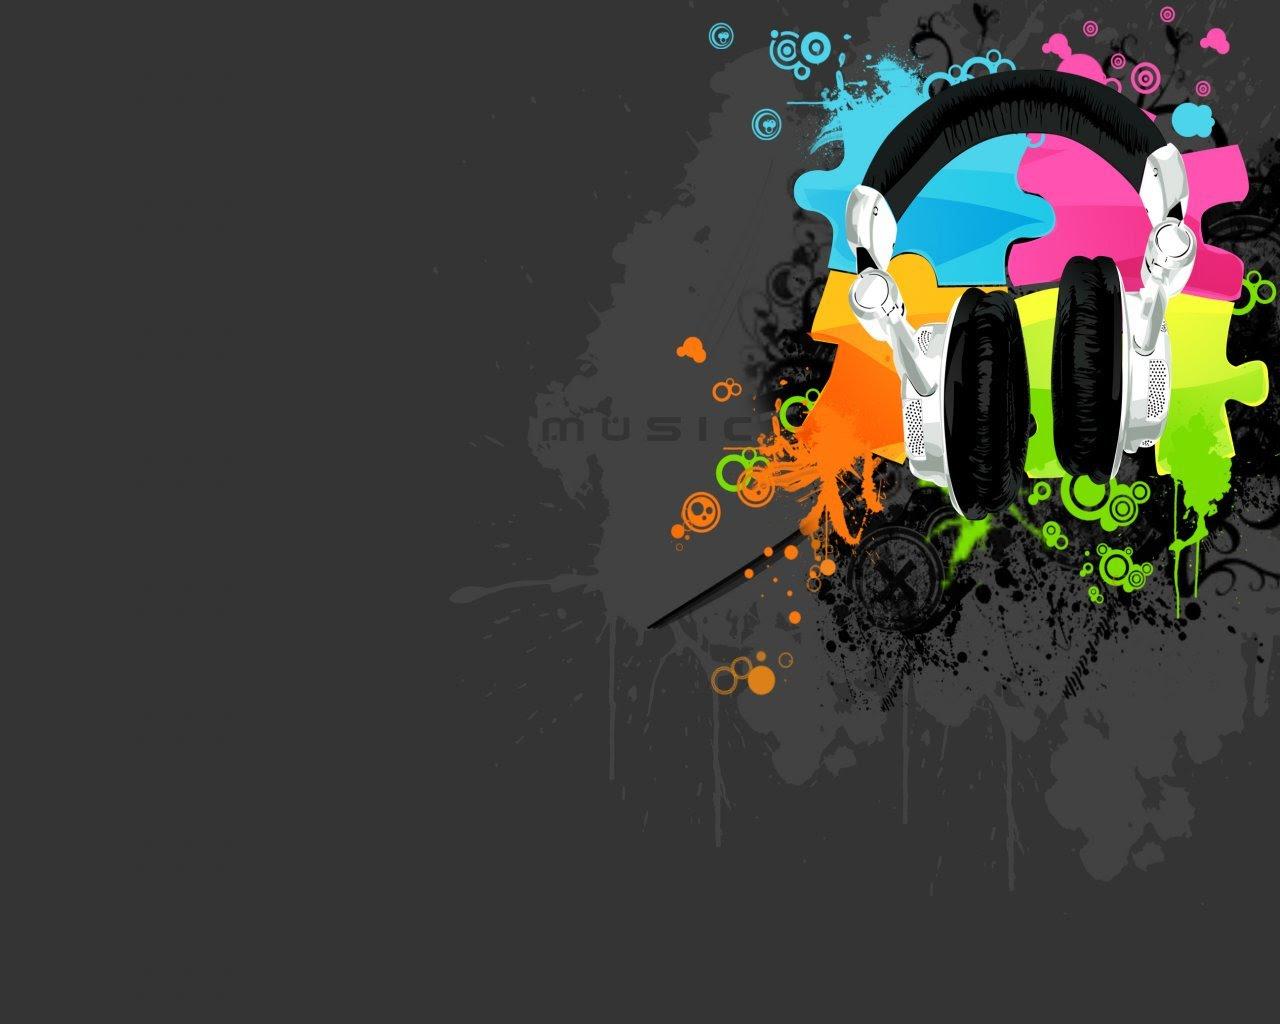 http://24.media.tumblr.com/tumblr_ma4356Ys091rgo7z1o1_1280.jpg